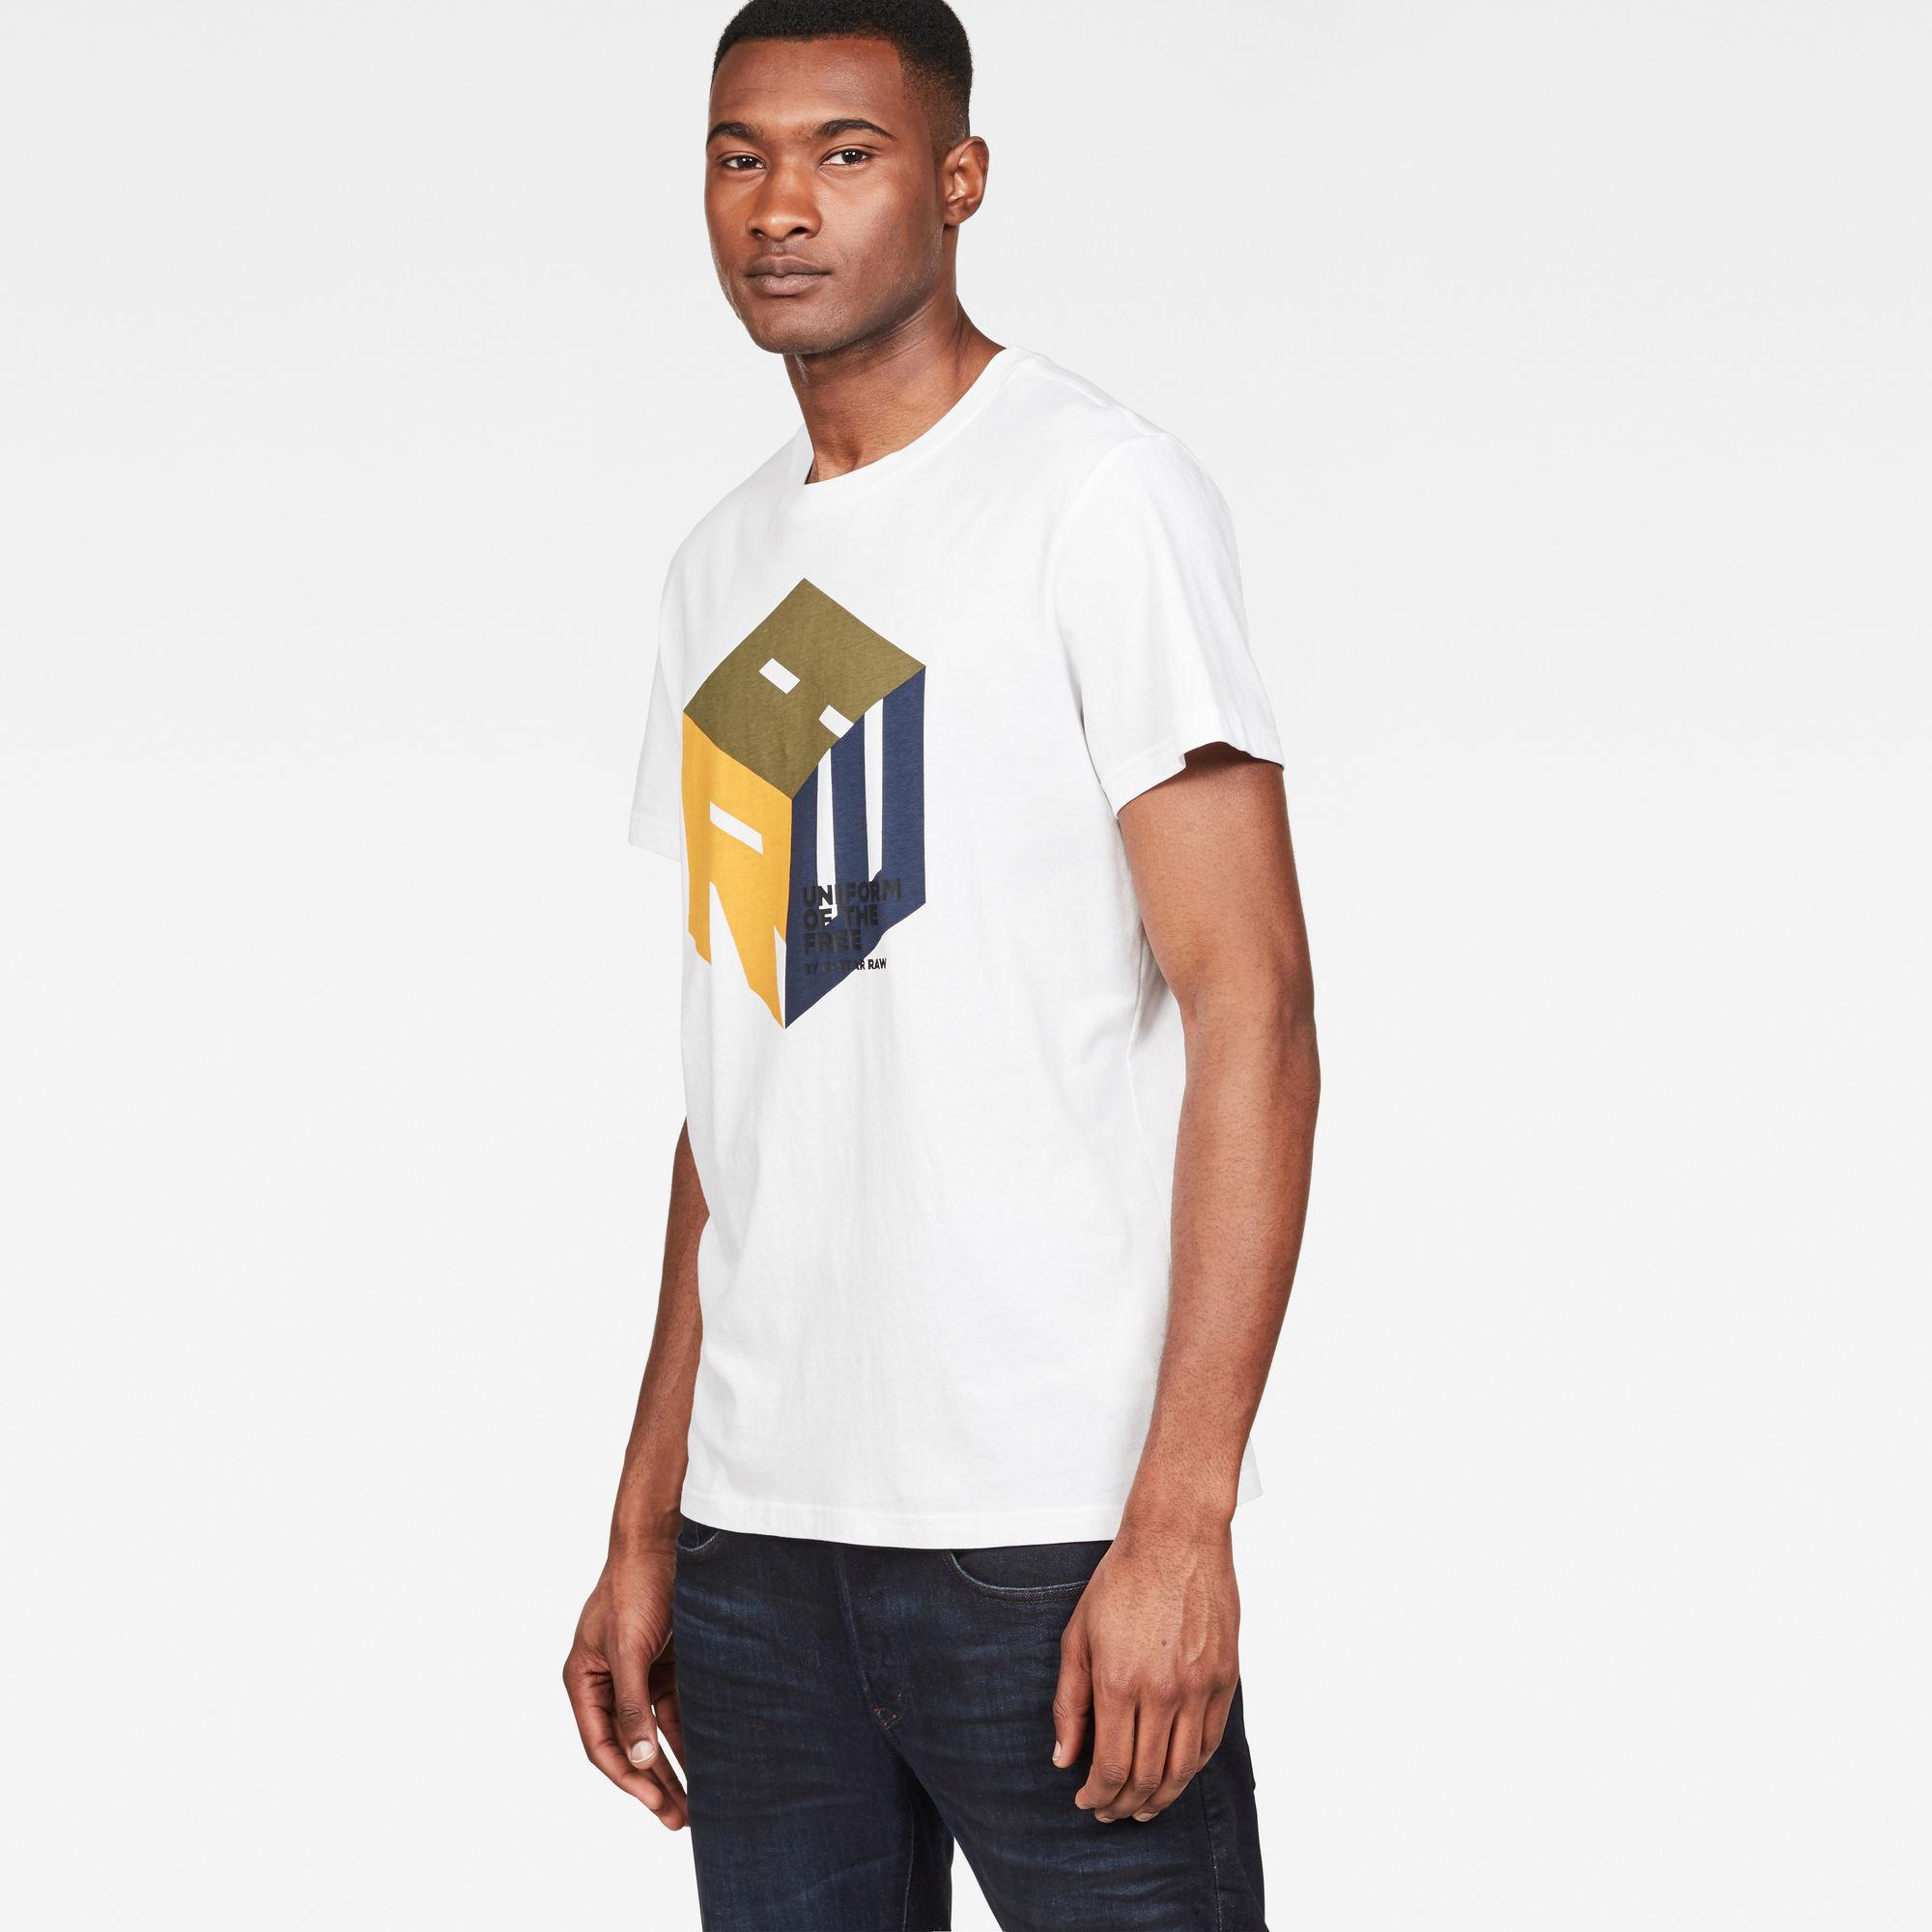 G-Star RAW Graphic 6 T-Shirt